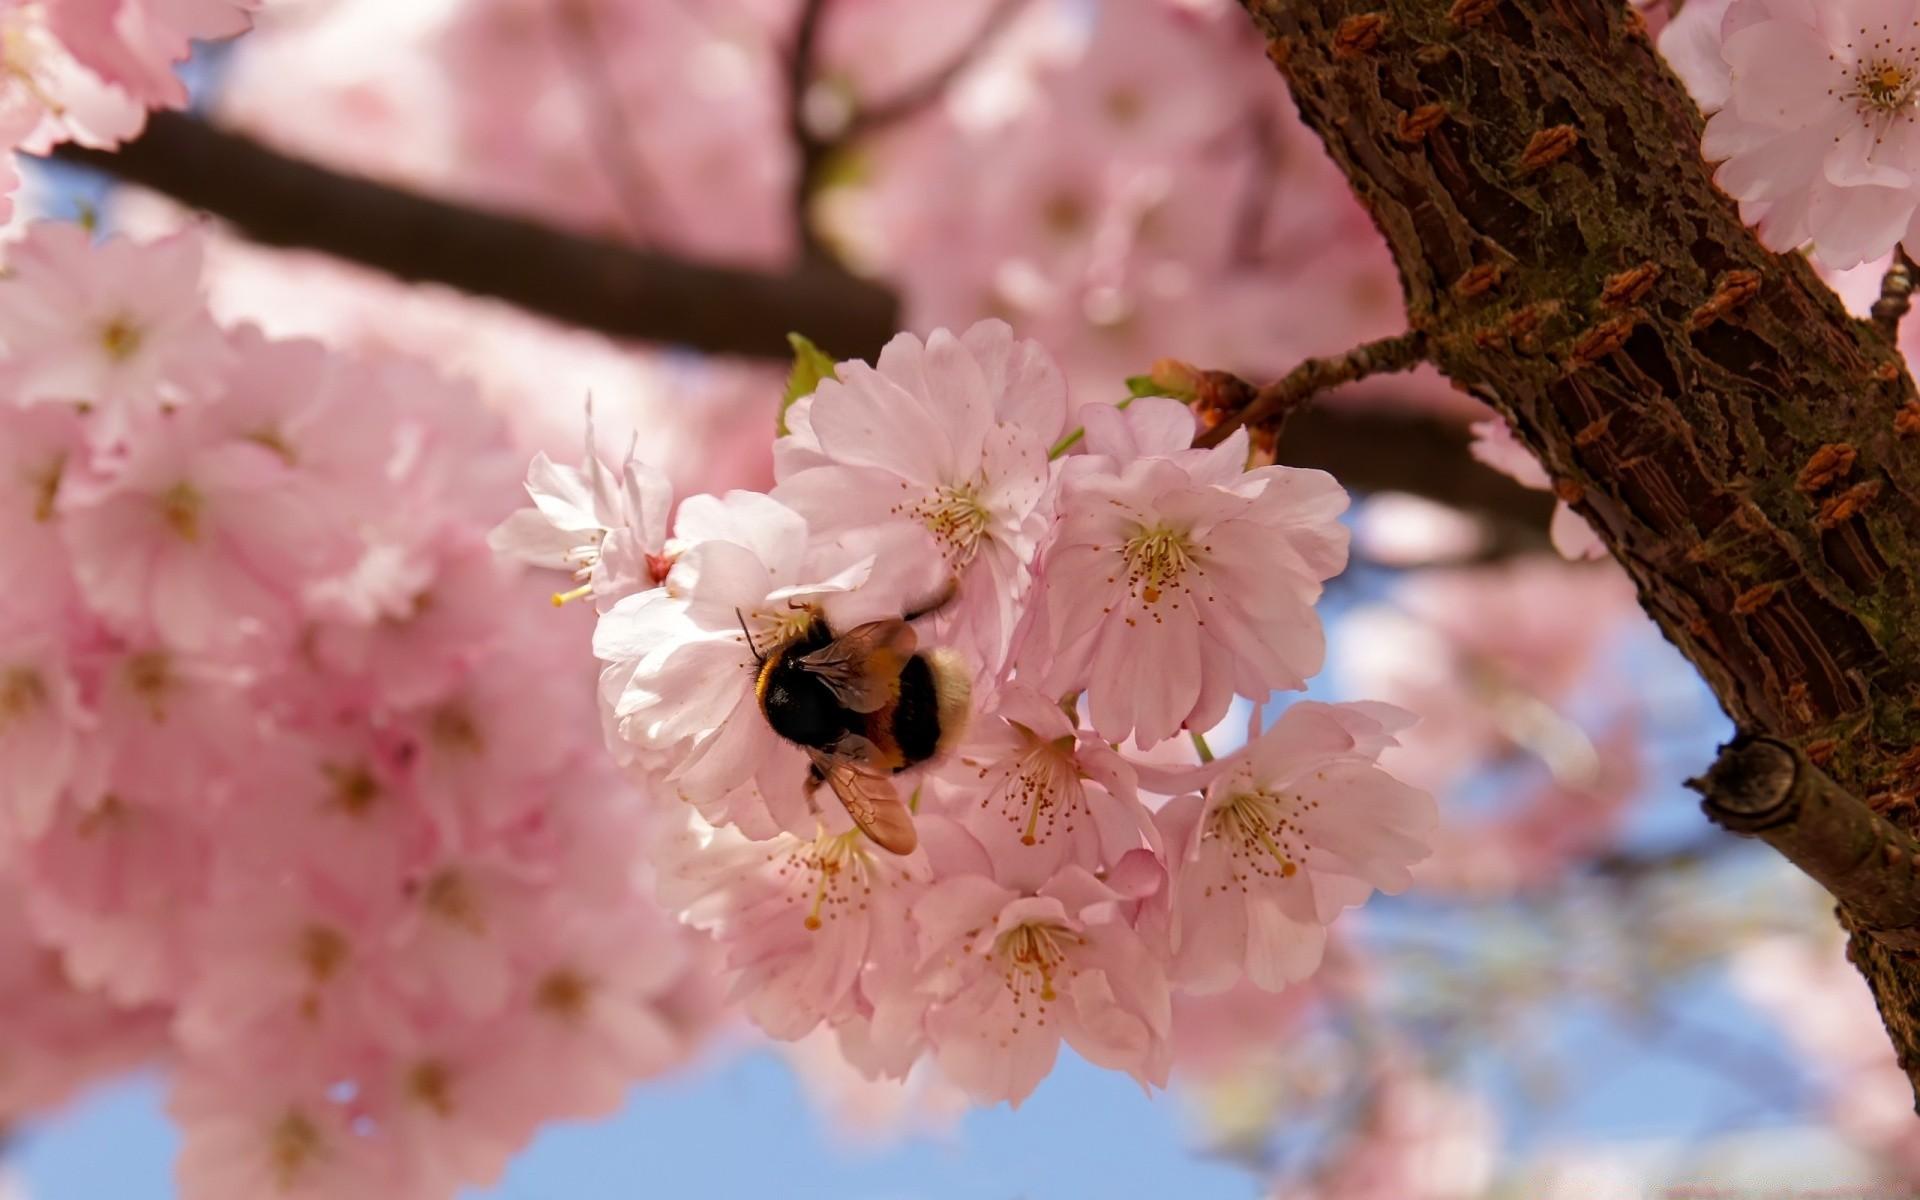 фотообои на телефон весна глубоко понимал, чувствовал